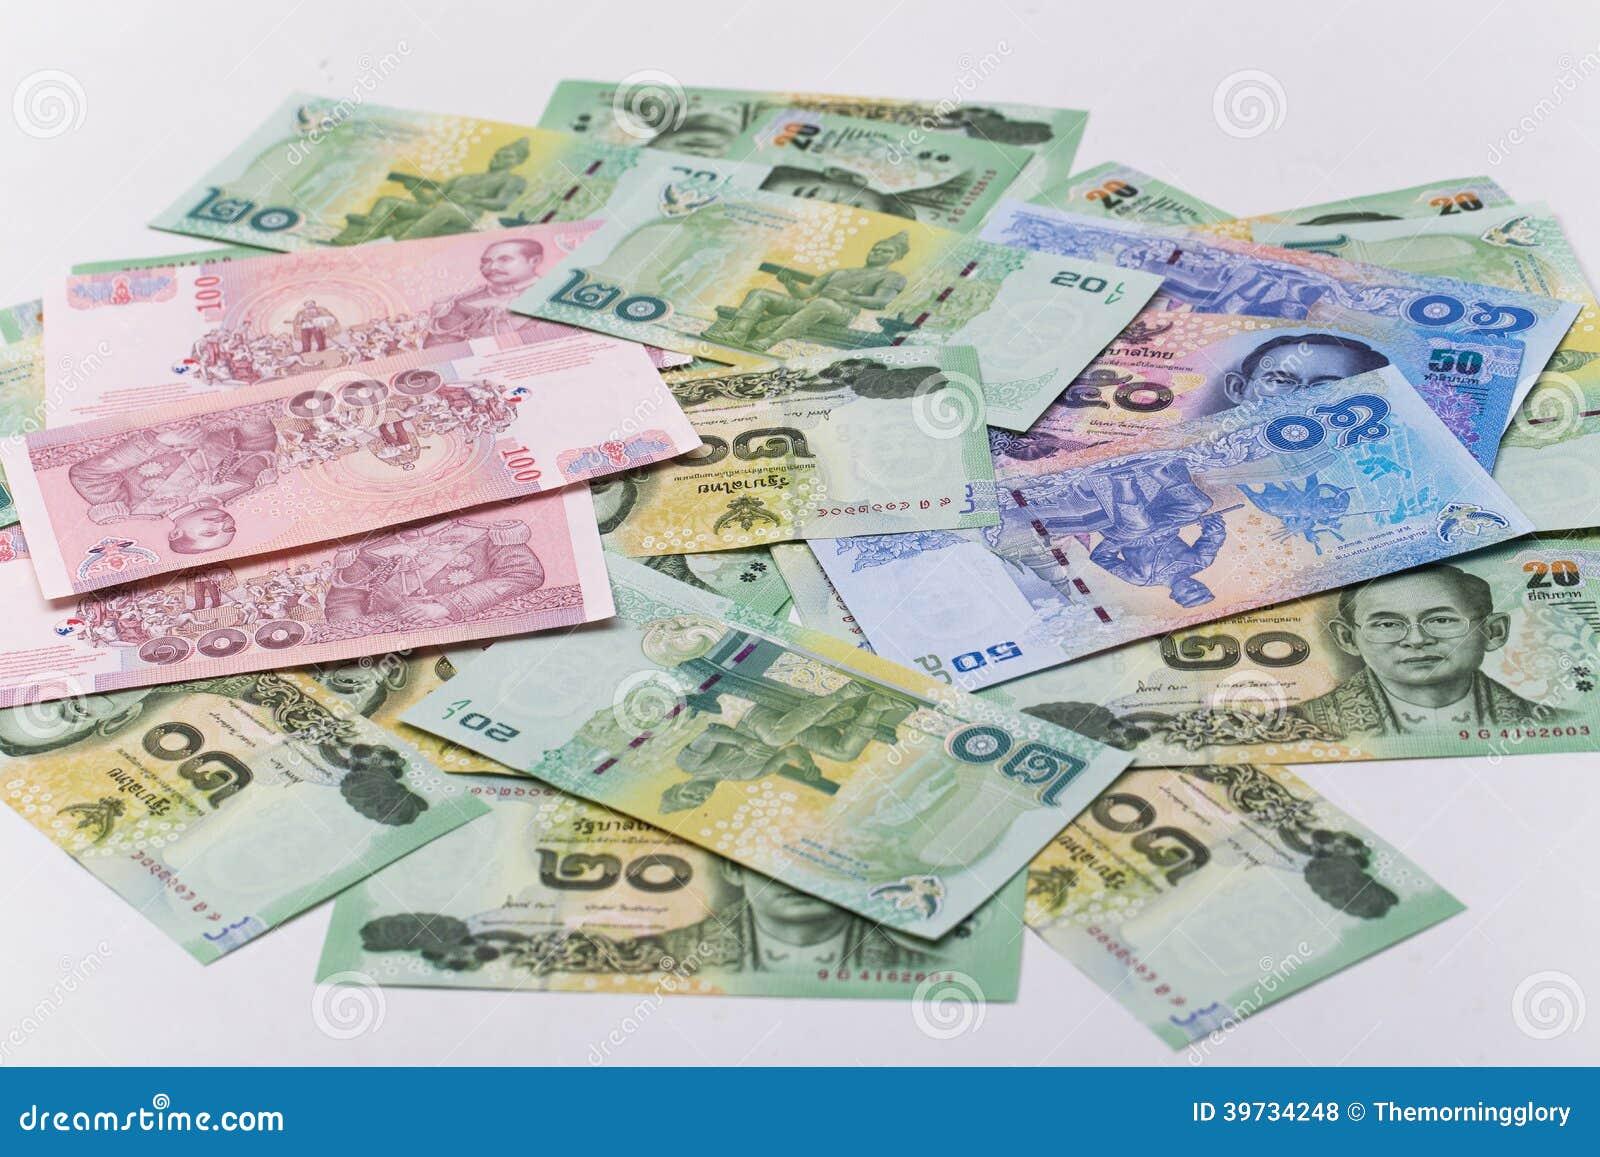 Thai Bath Close Up Of Money Stock Photo - Image of ...